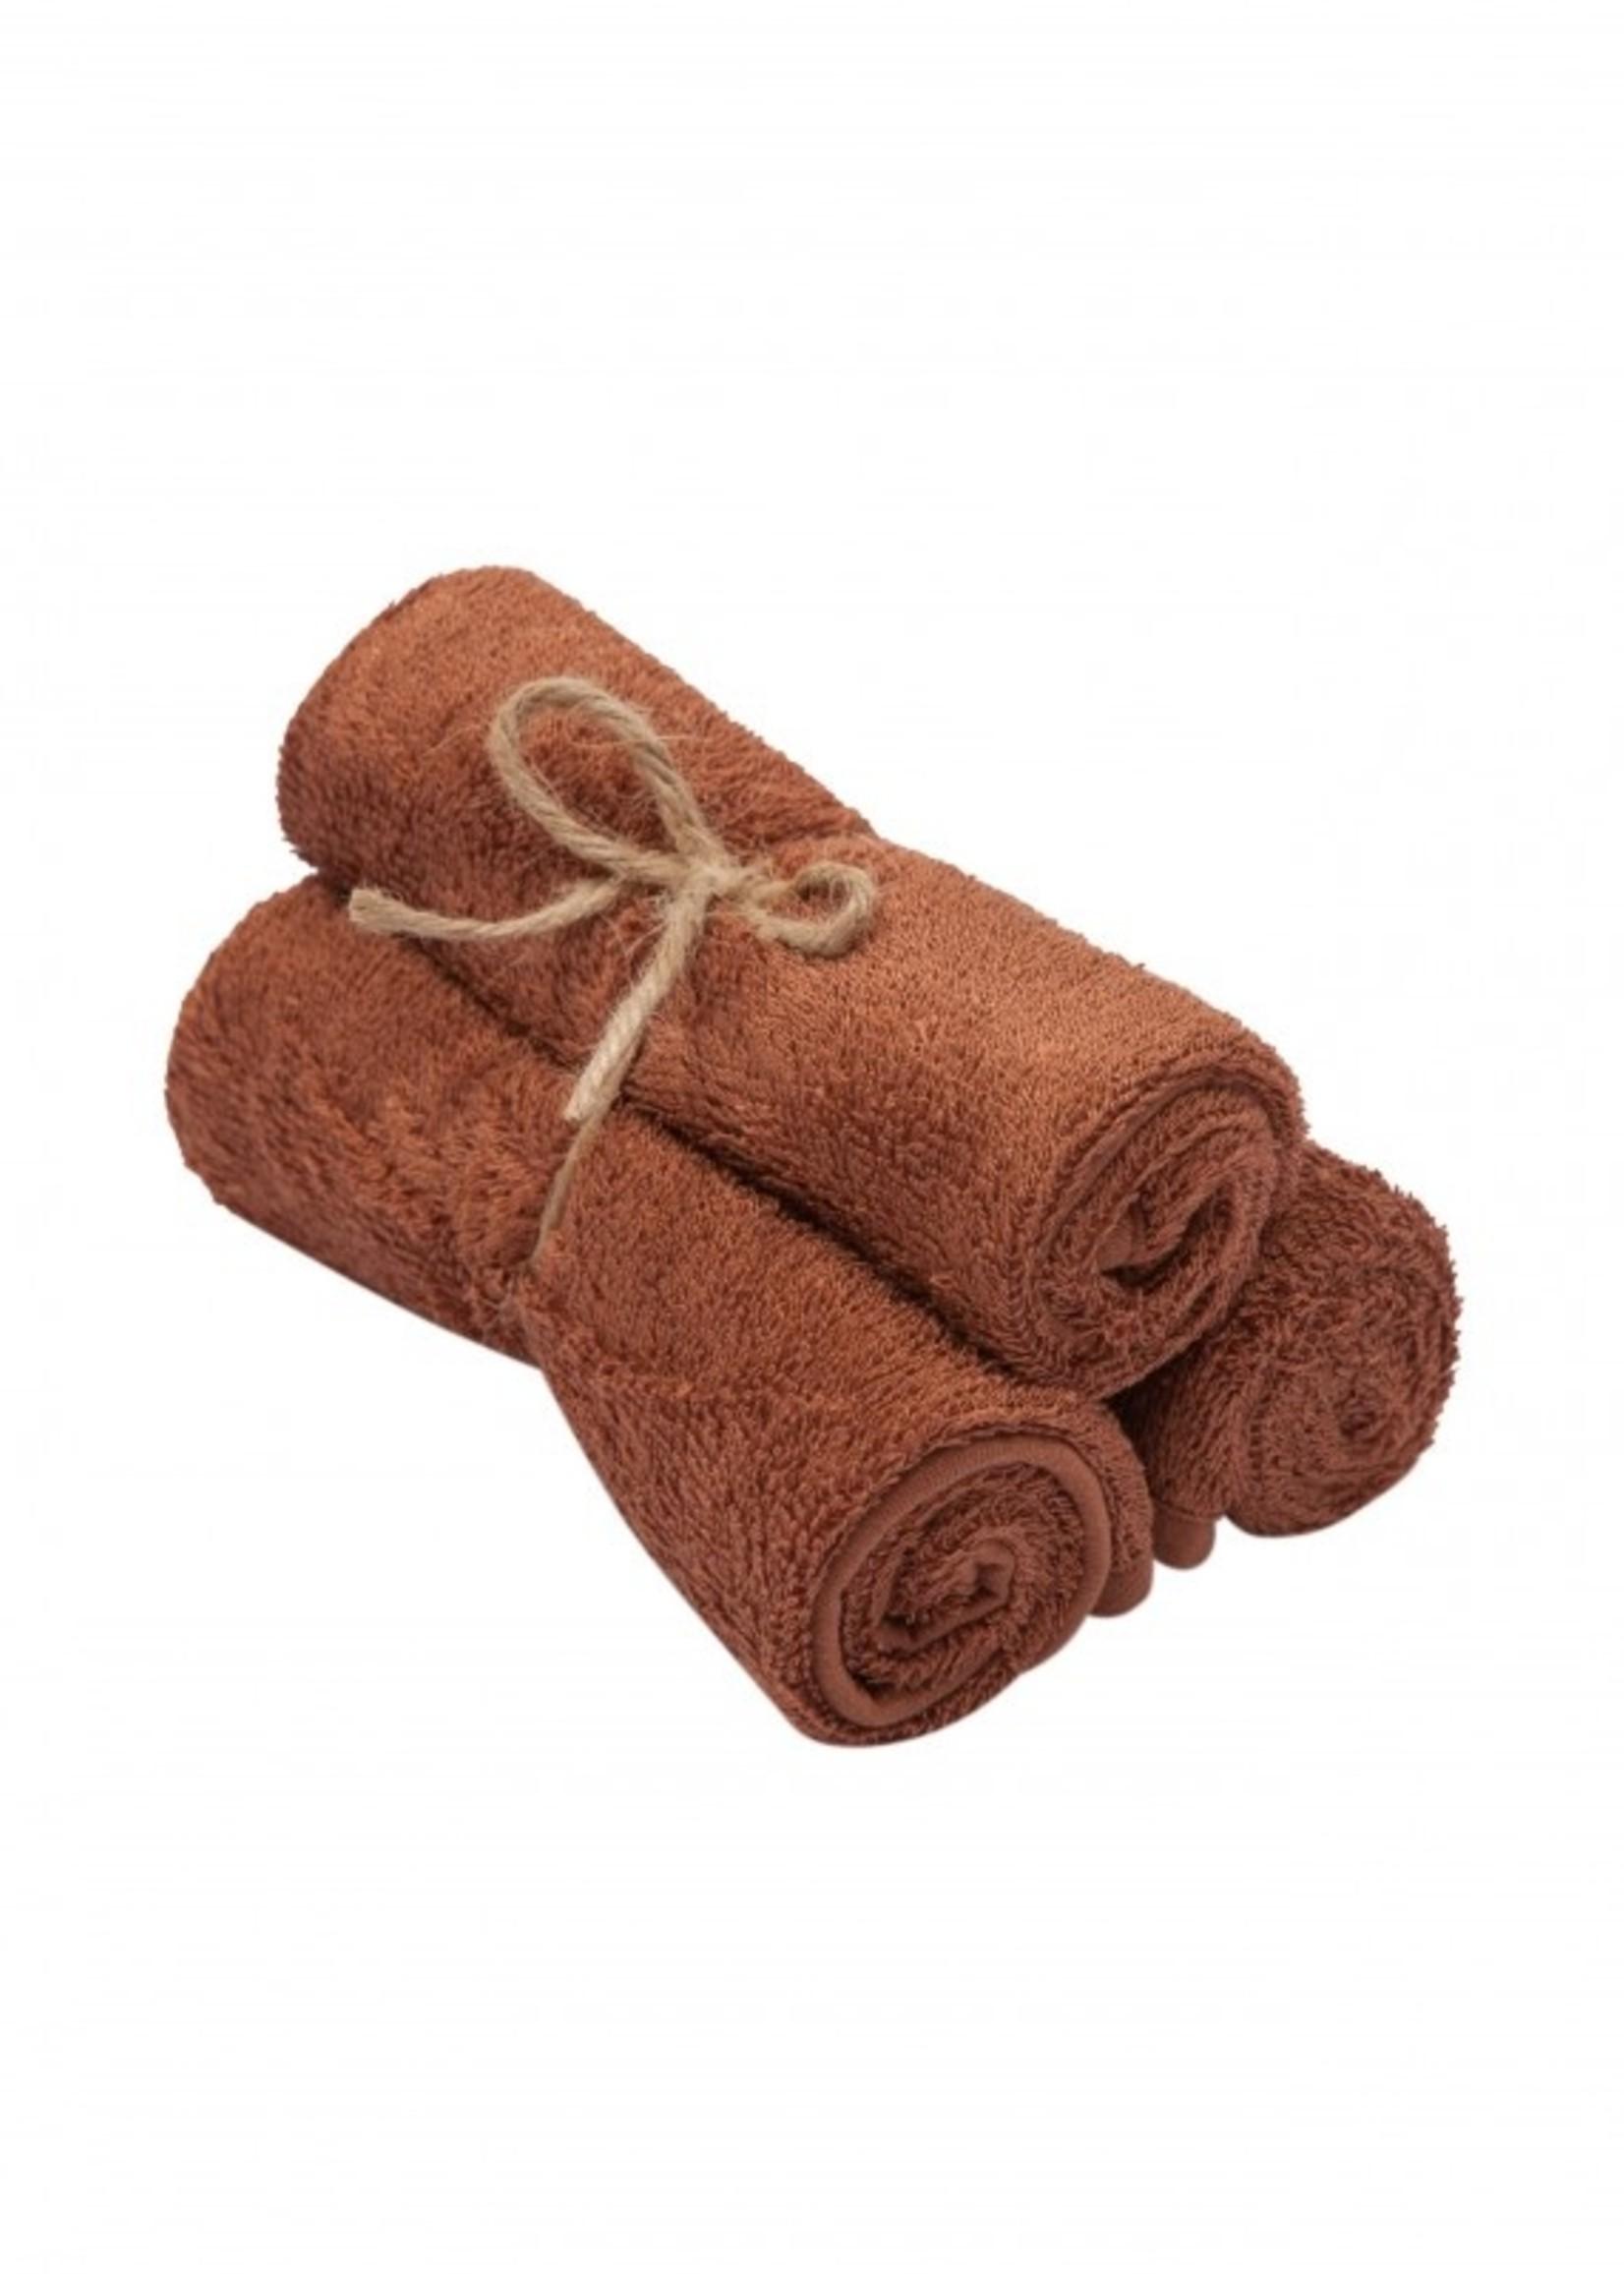 Timboo Set 3 Small Towels - Hazel Brown